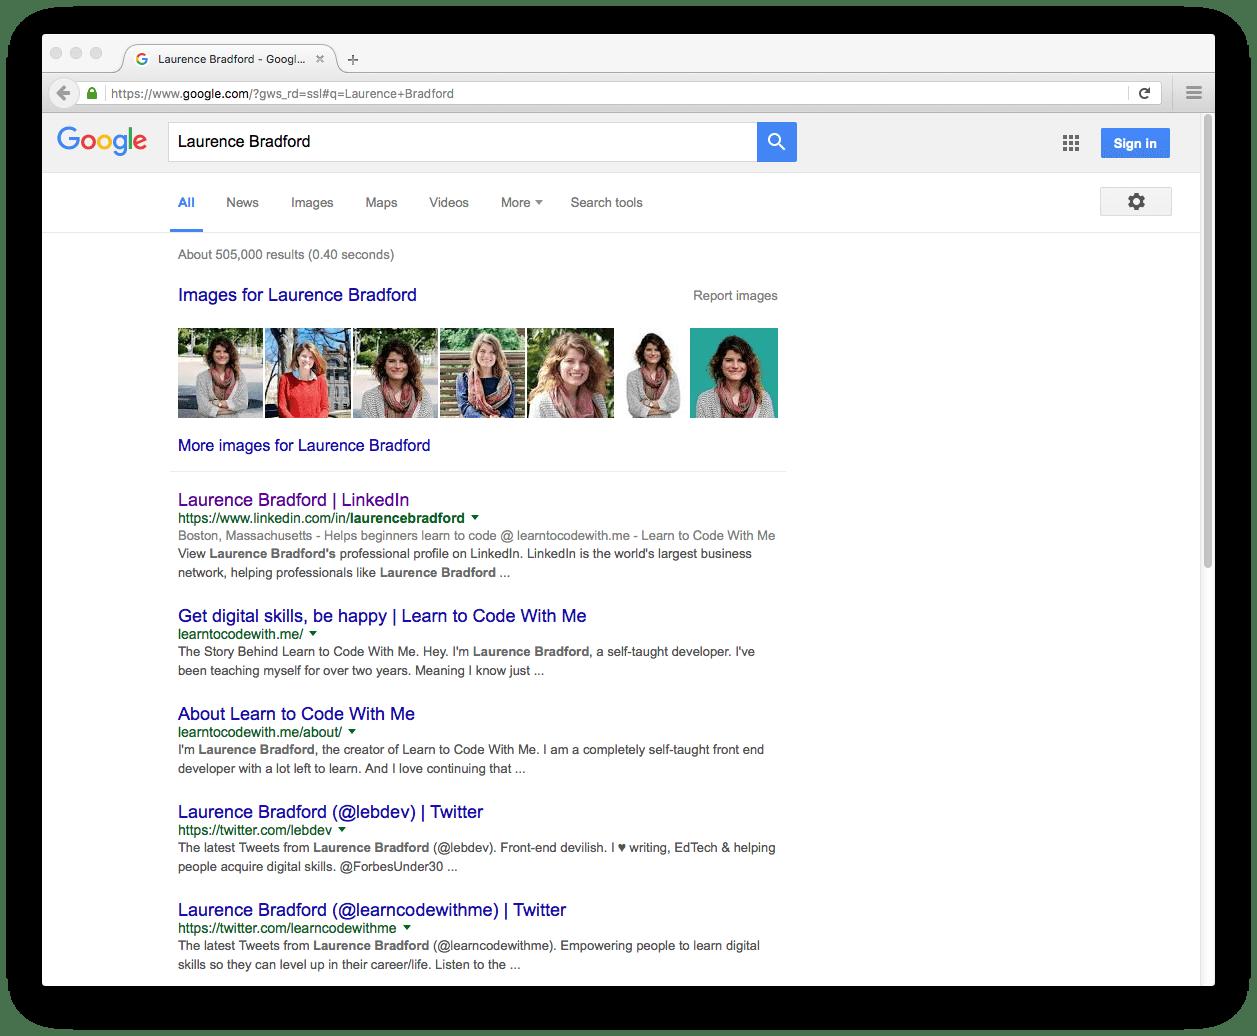 Laurence Bradford Google Search